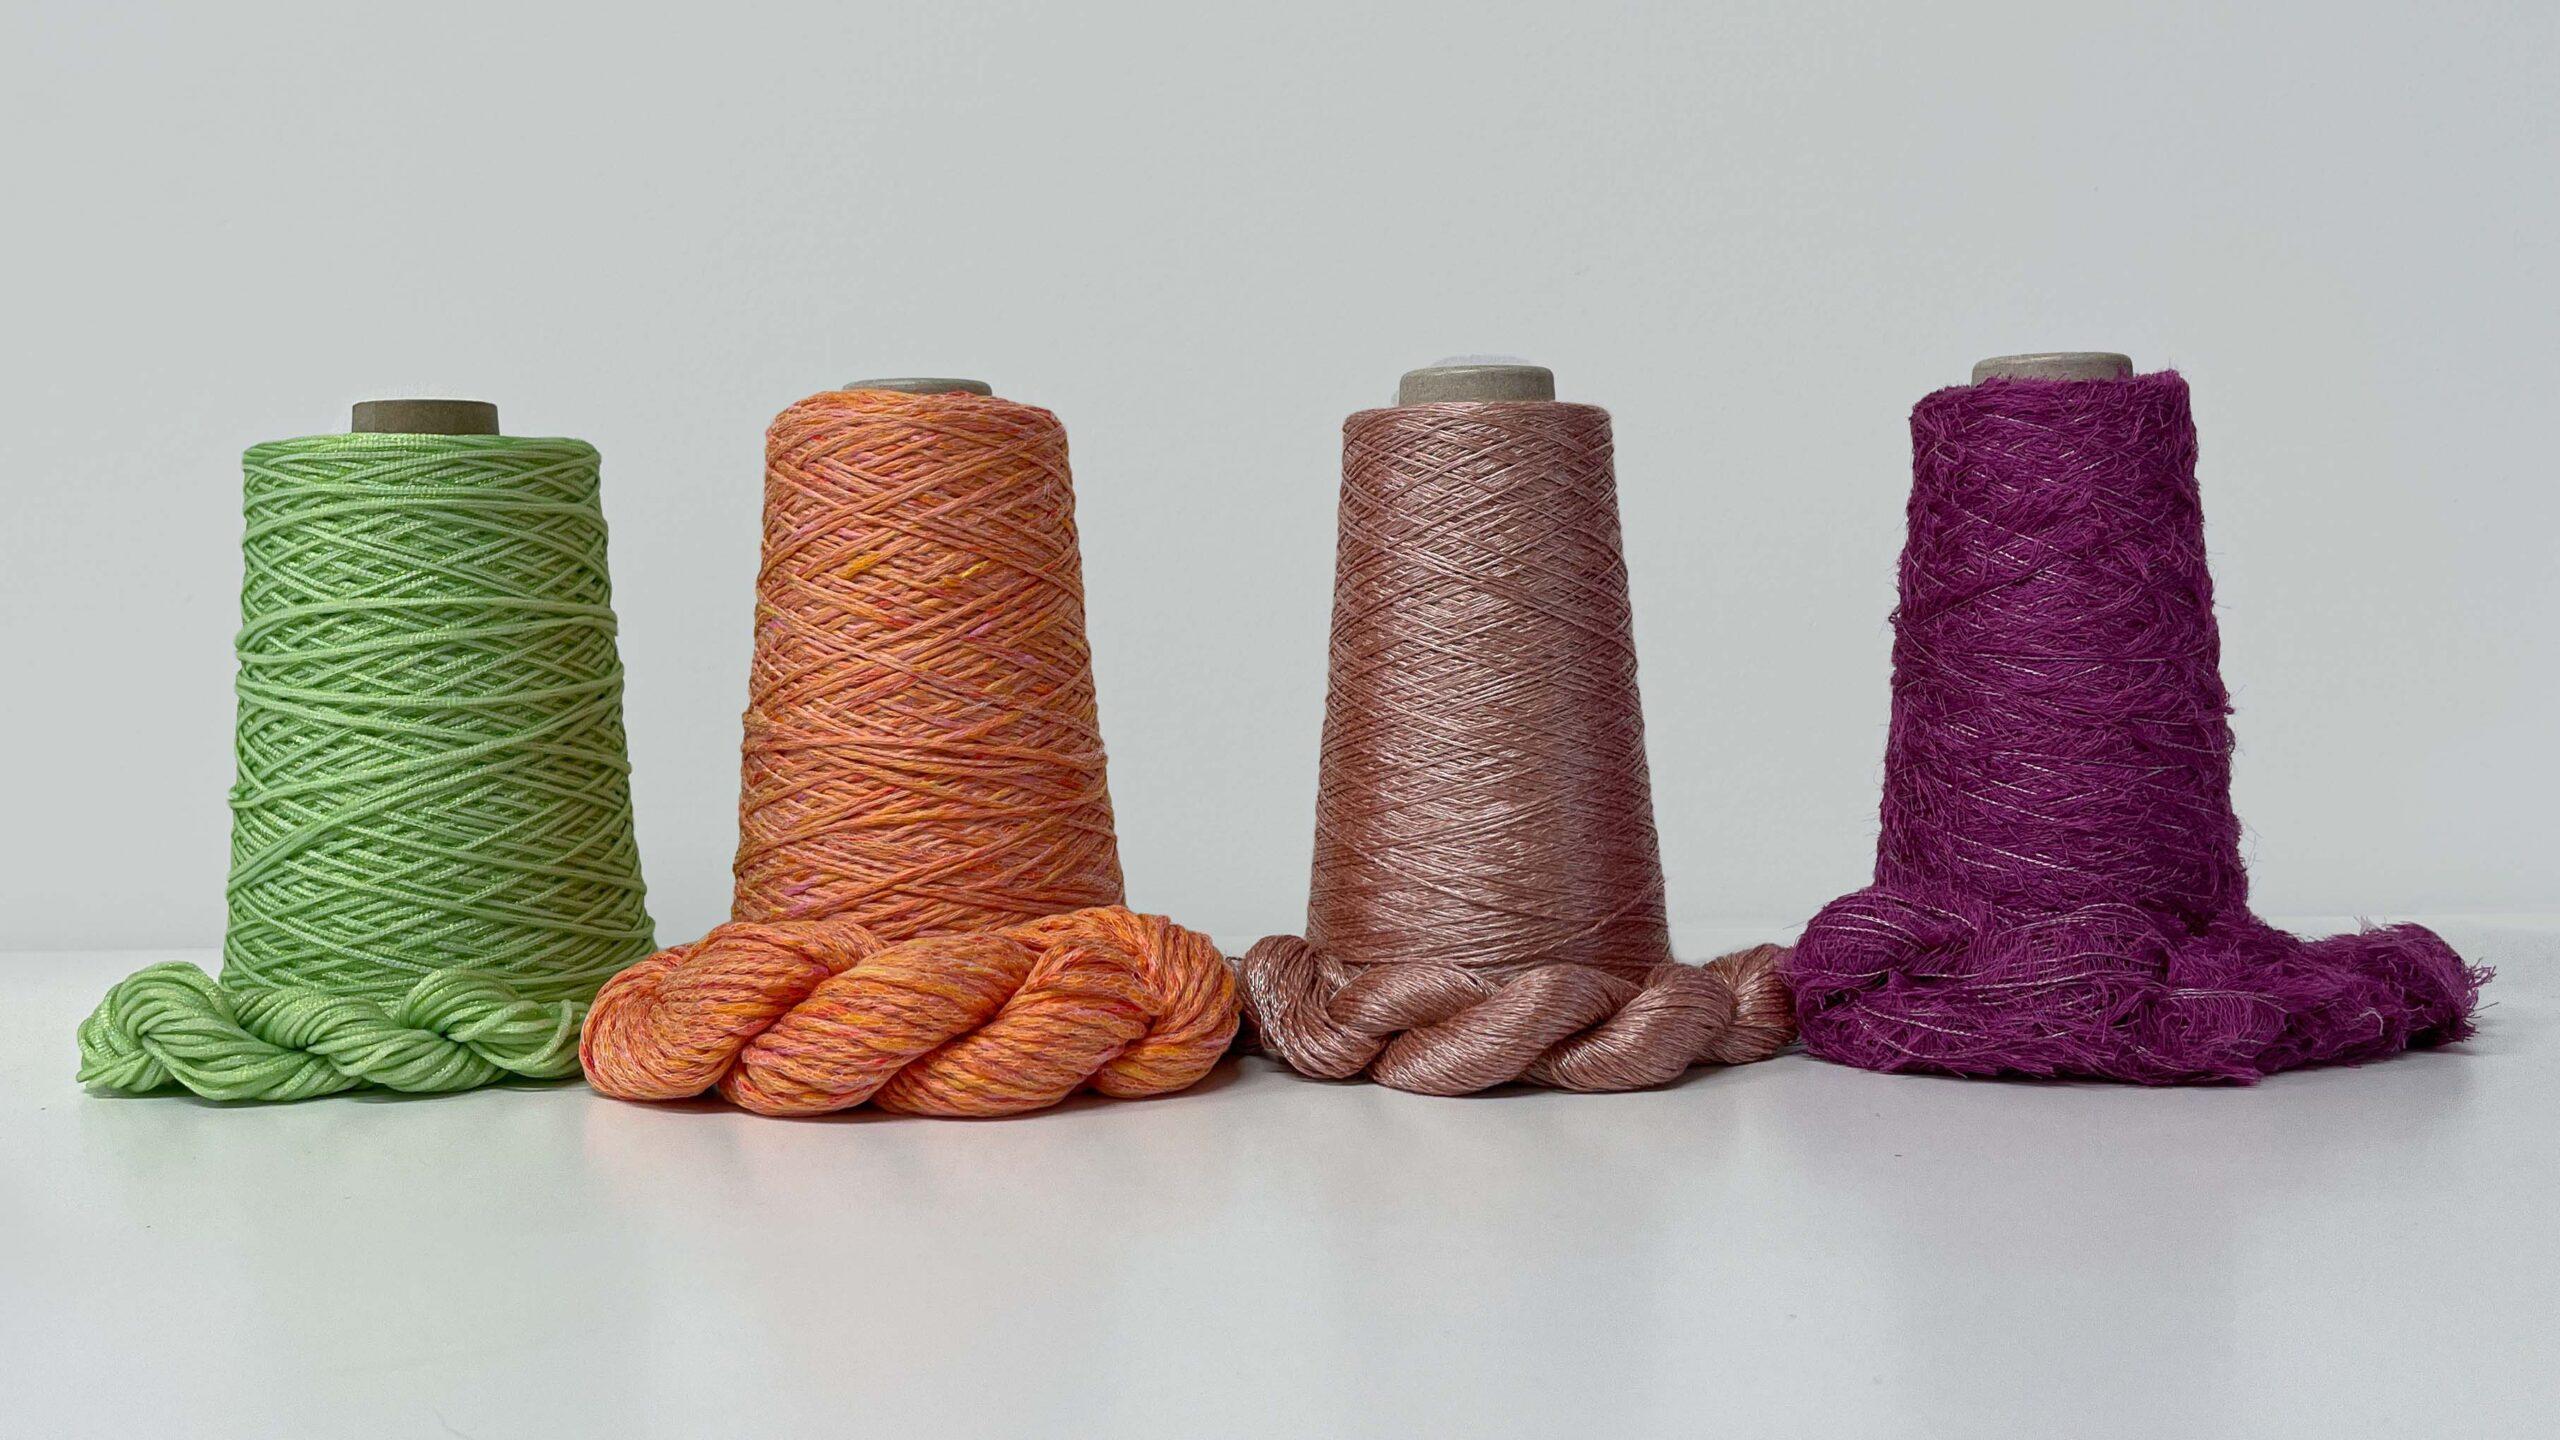 Spin Aker SS-22 knitting